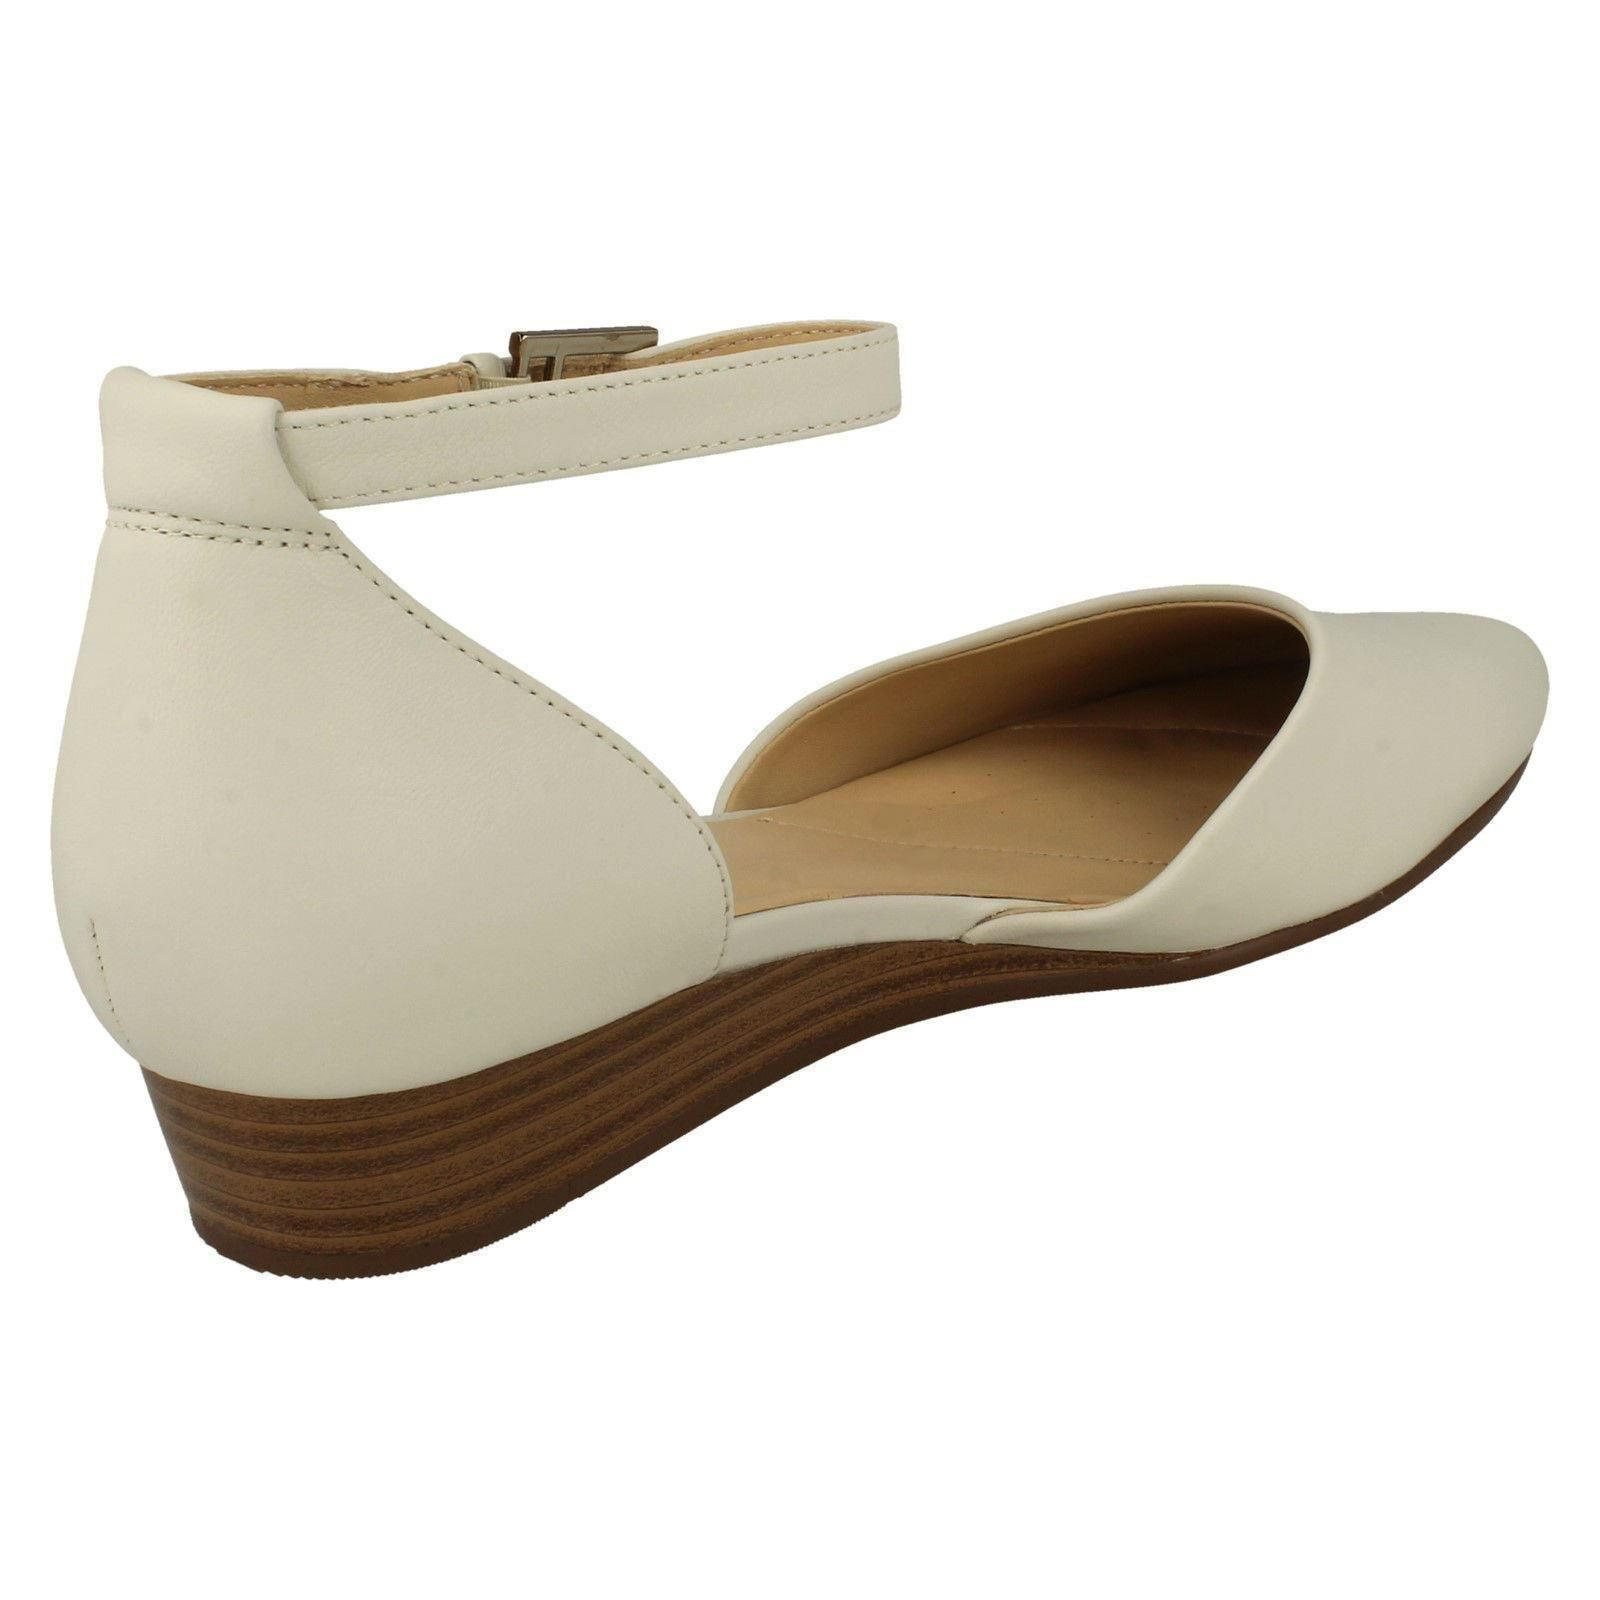 Mesdames Clarks Summer Wedge chaussures à talons sens Eva